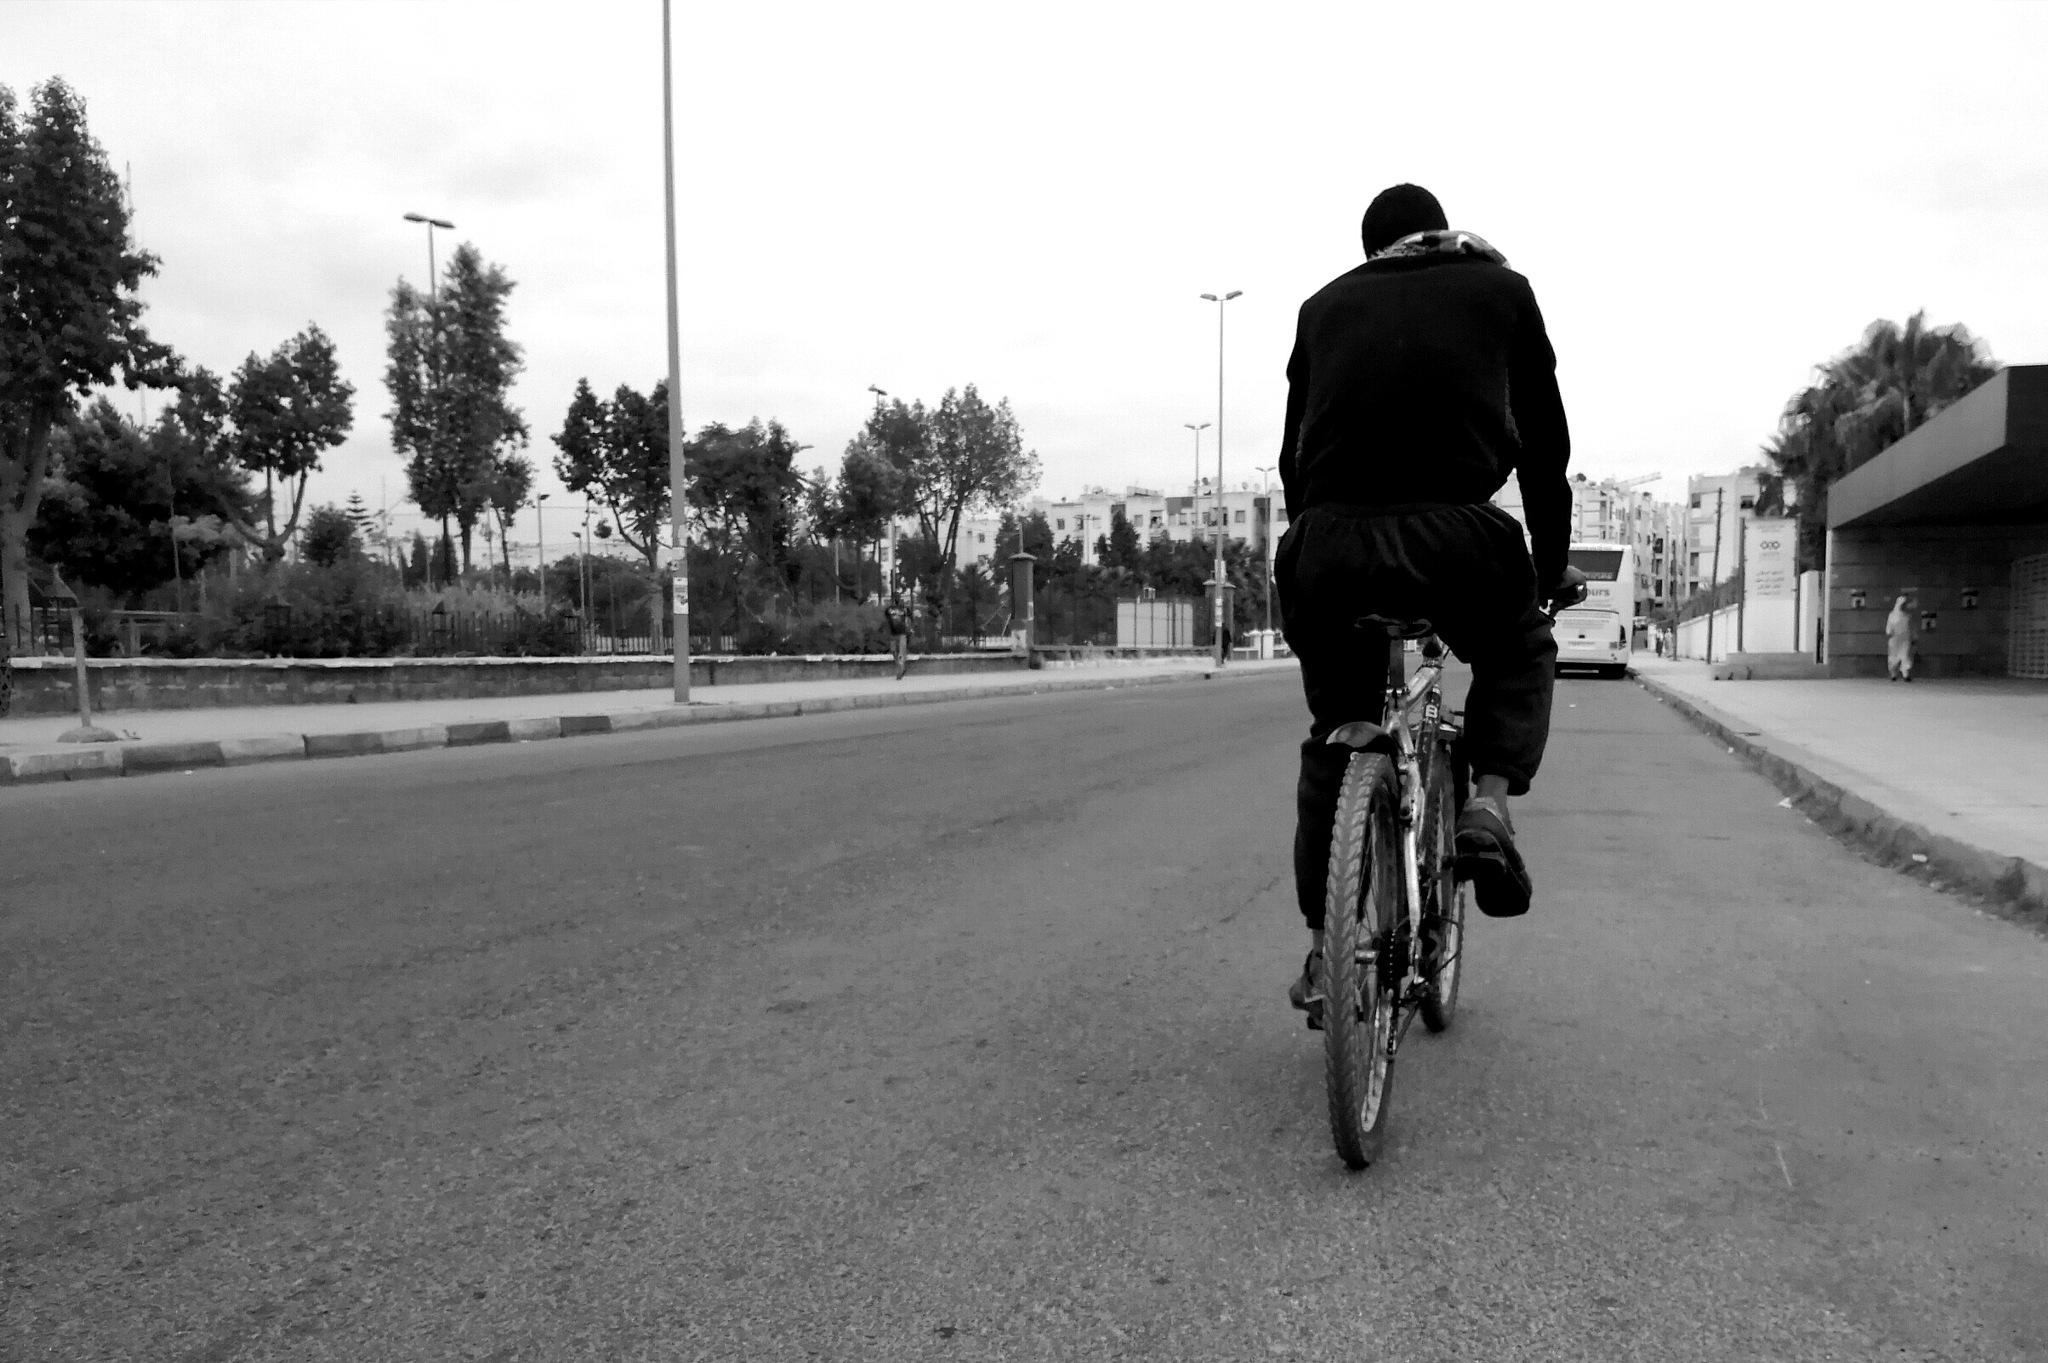 Untitled by Abdorrahim